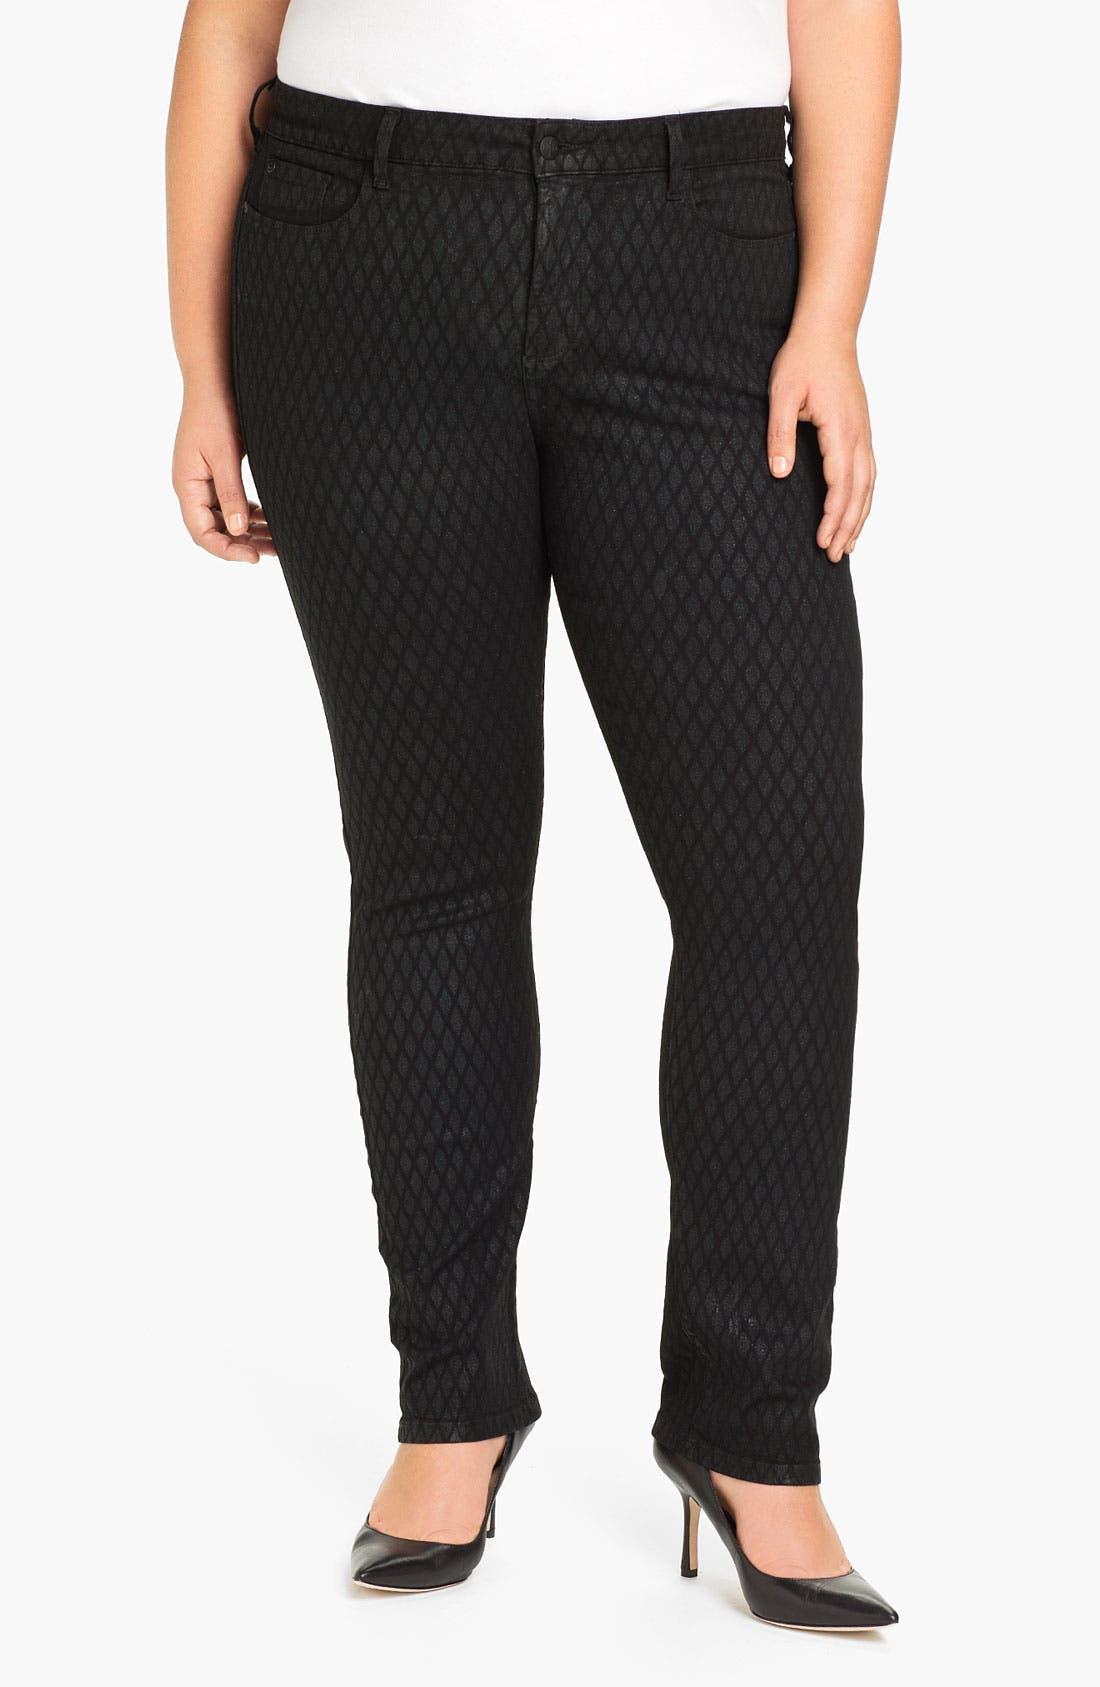 Alternate Image 1 Selected - NYDJ 'Sheri - Geometric Glitter' Skinny Denim Jeans (Plus)